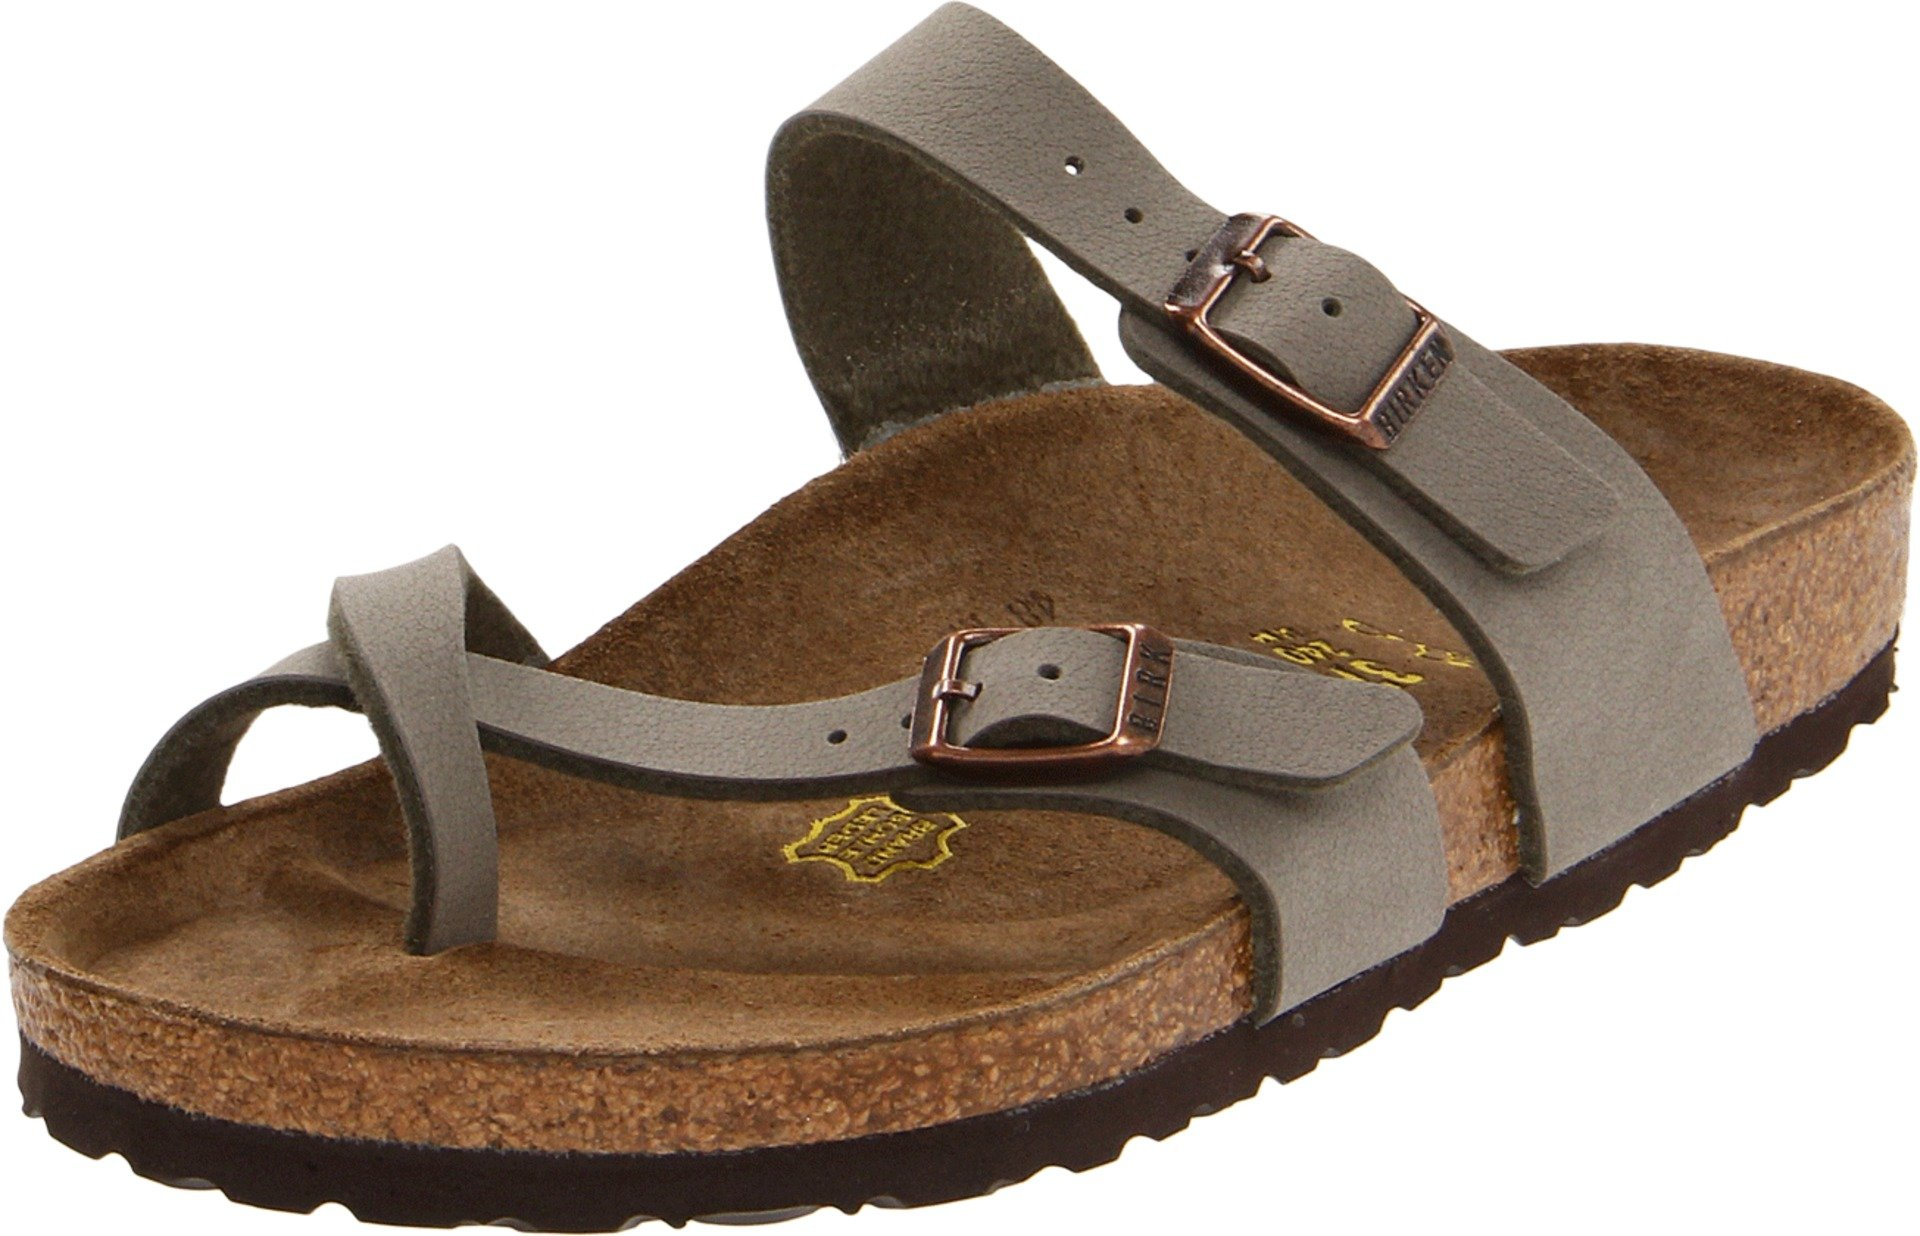 Birkenstock Women's Mayari Thong Sandal,Stone,EU Size 38/Women's US Size 7-7.5